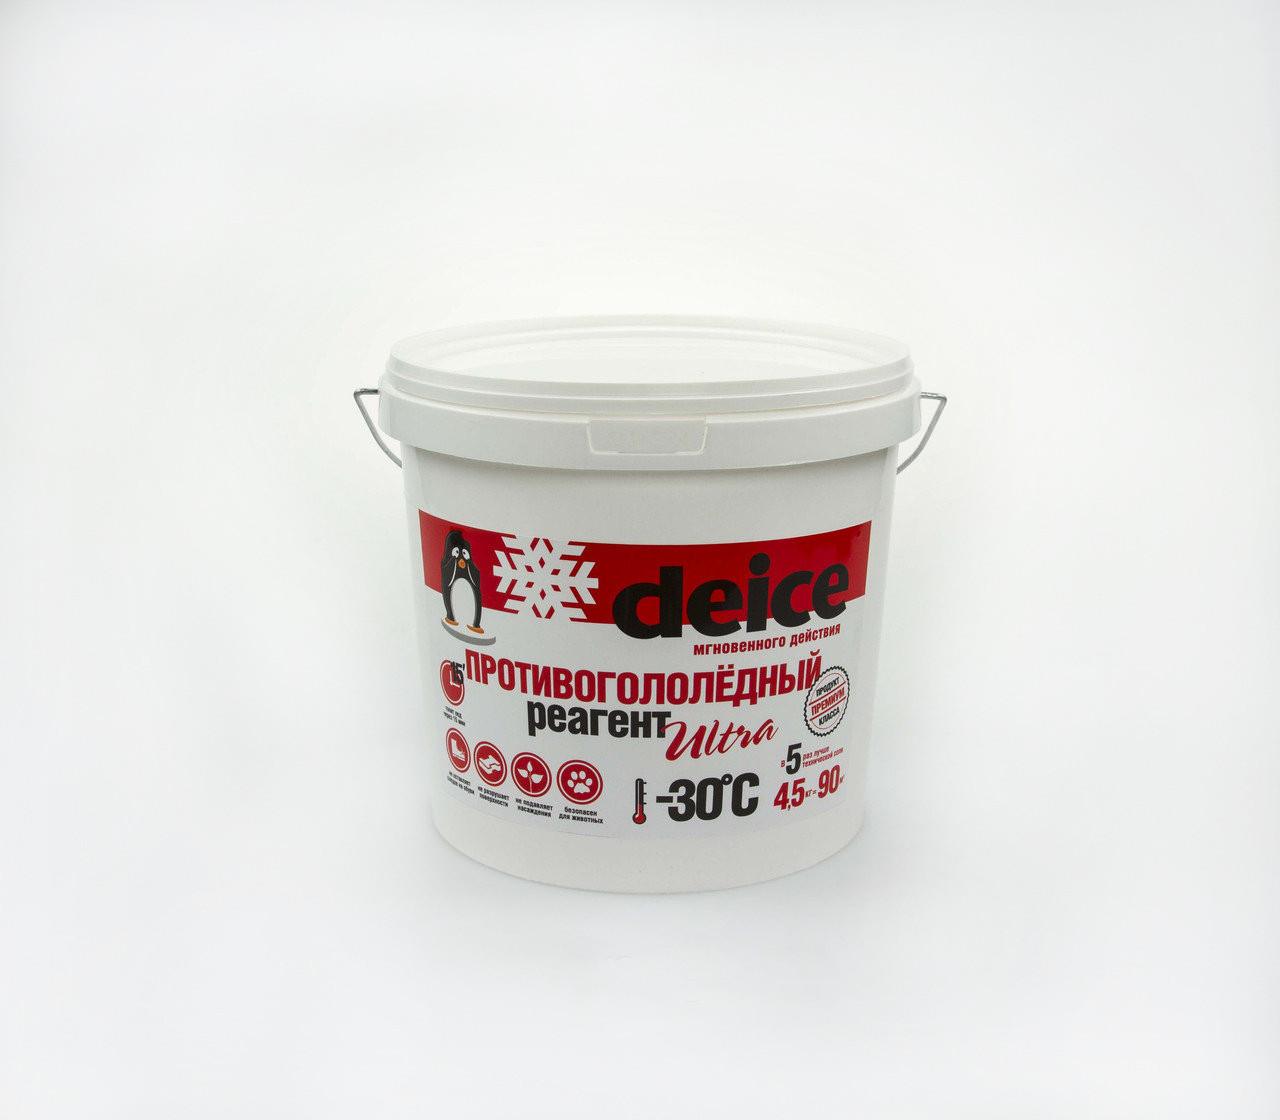 Противогололедные реагенты Deice Ultra кристал - 4,5 кг.